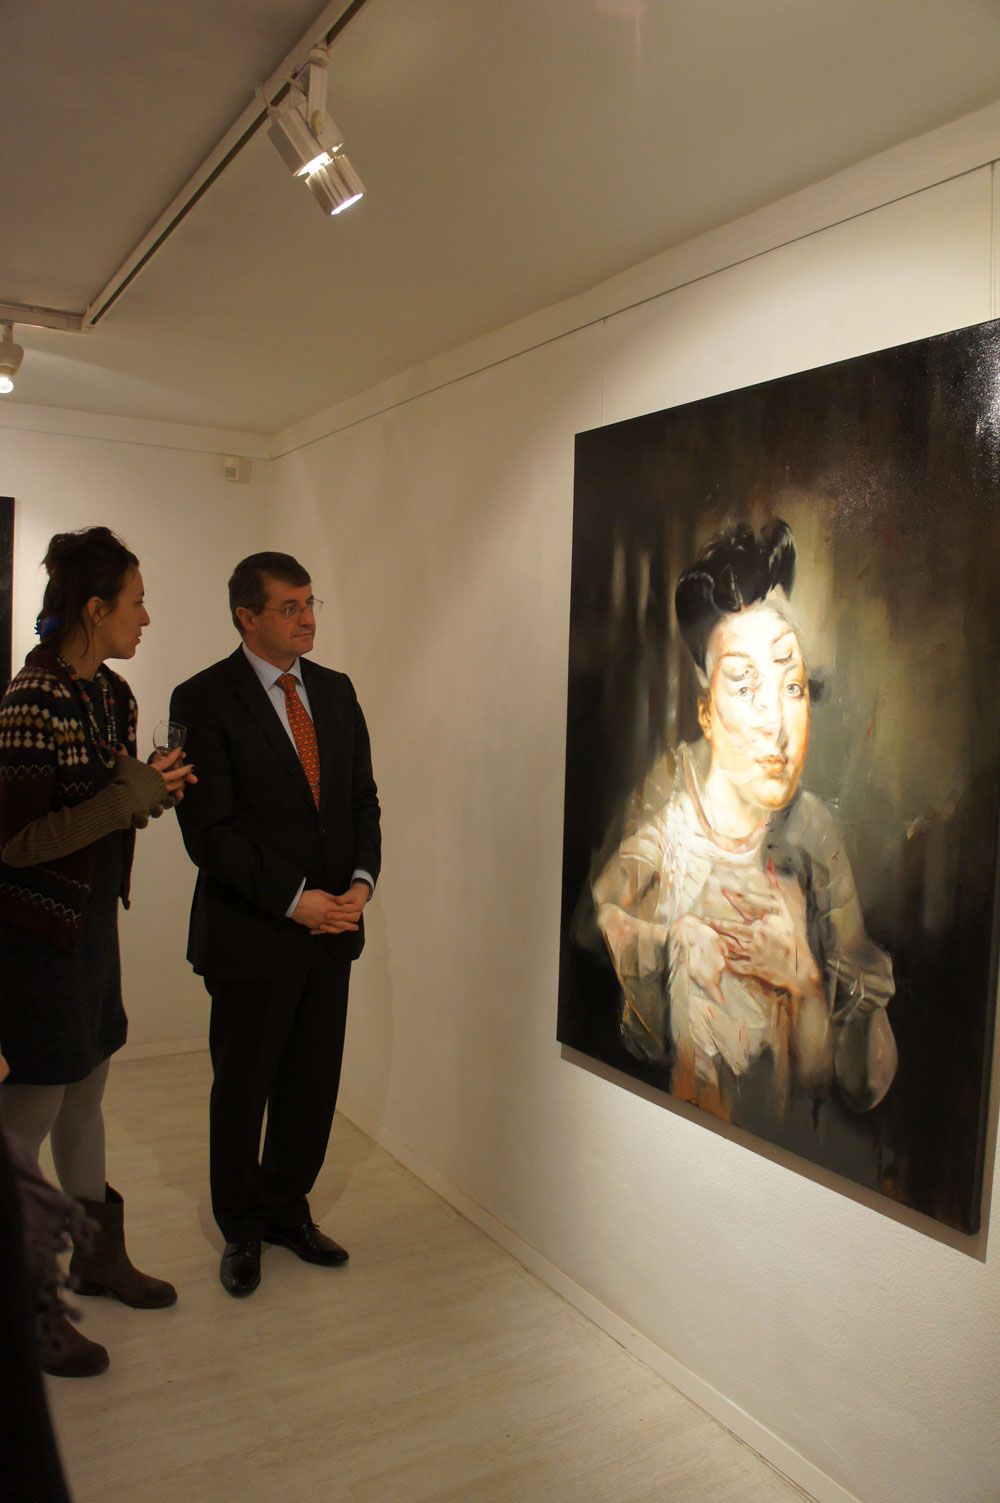 Flavia-Pitis-Back-into-Illusion-@-Varfok-Gallery-Budapest-6